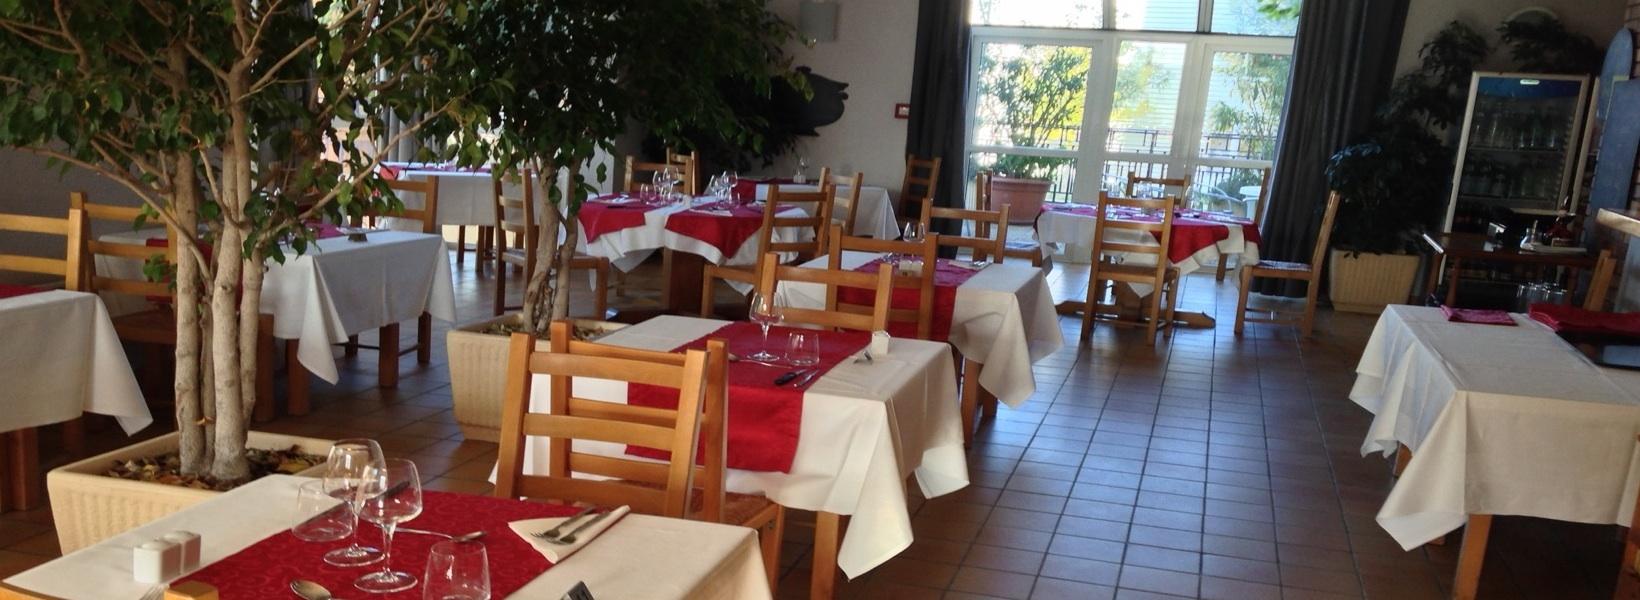 Restaurant traditionnel Lons